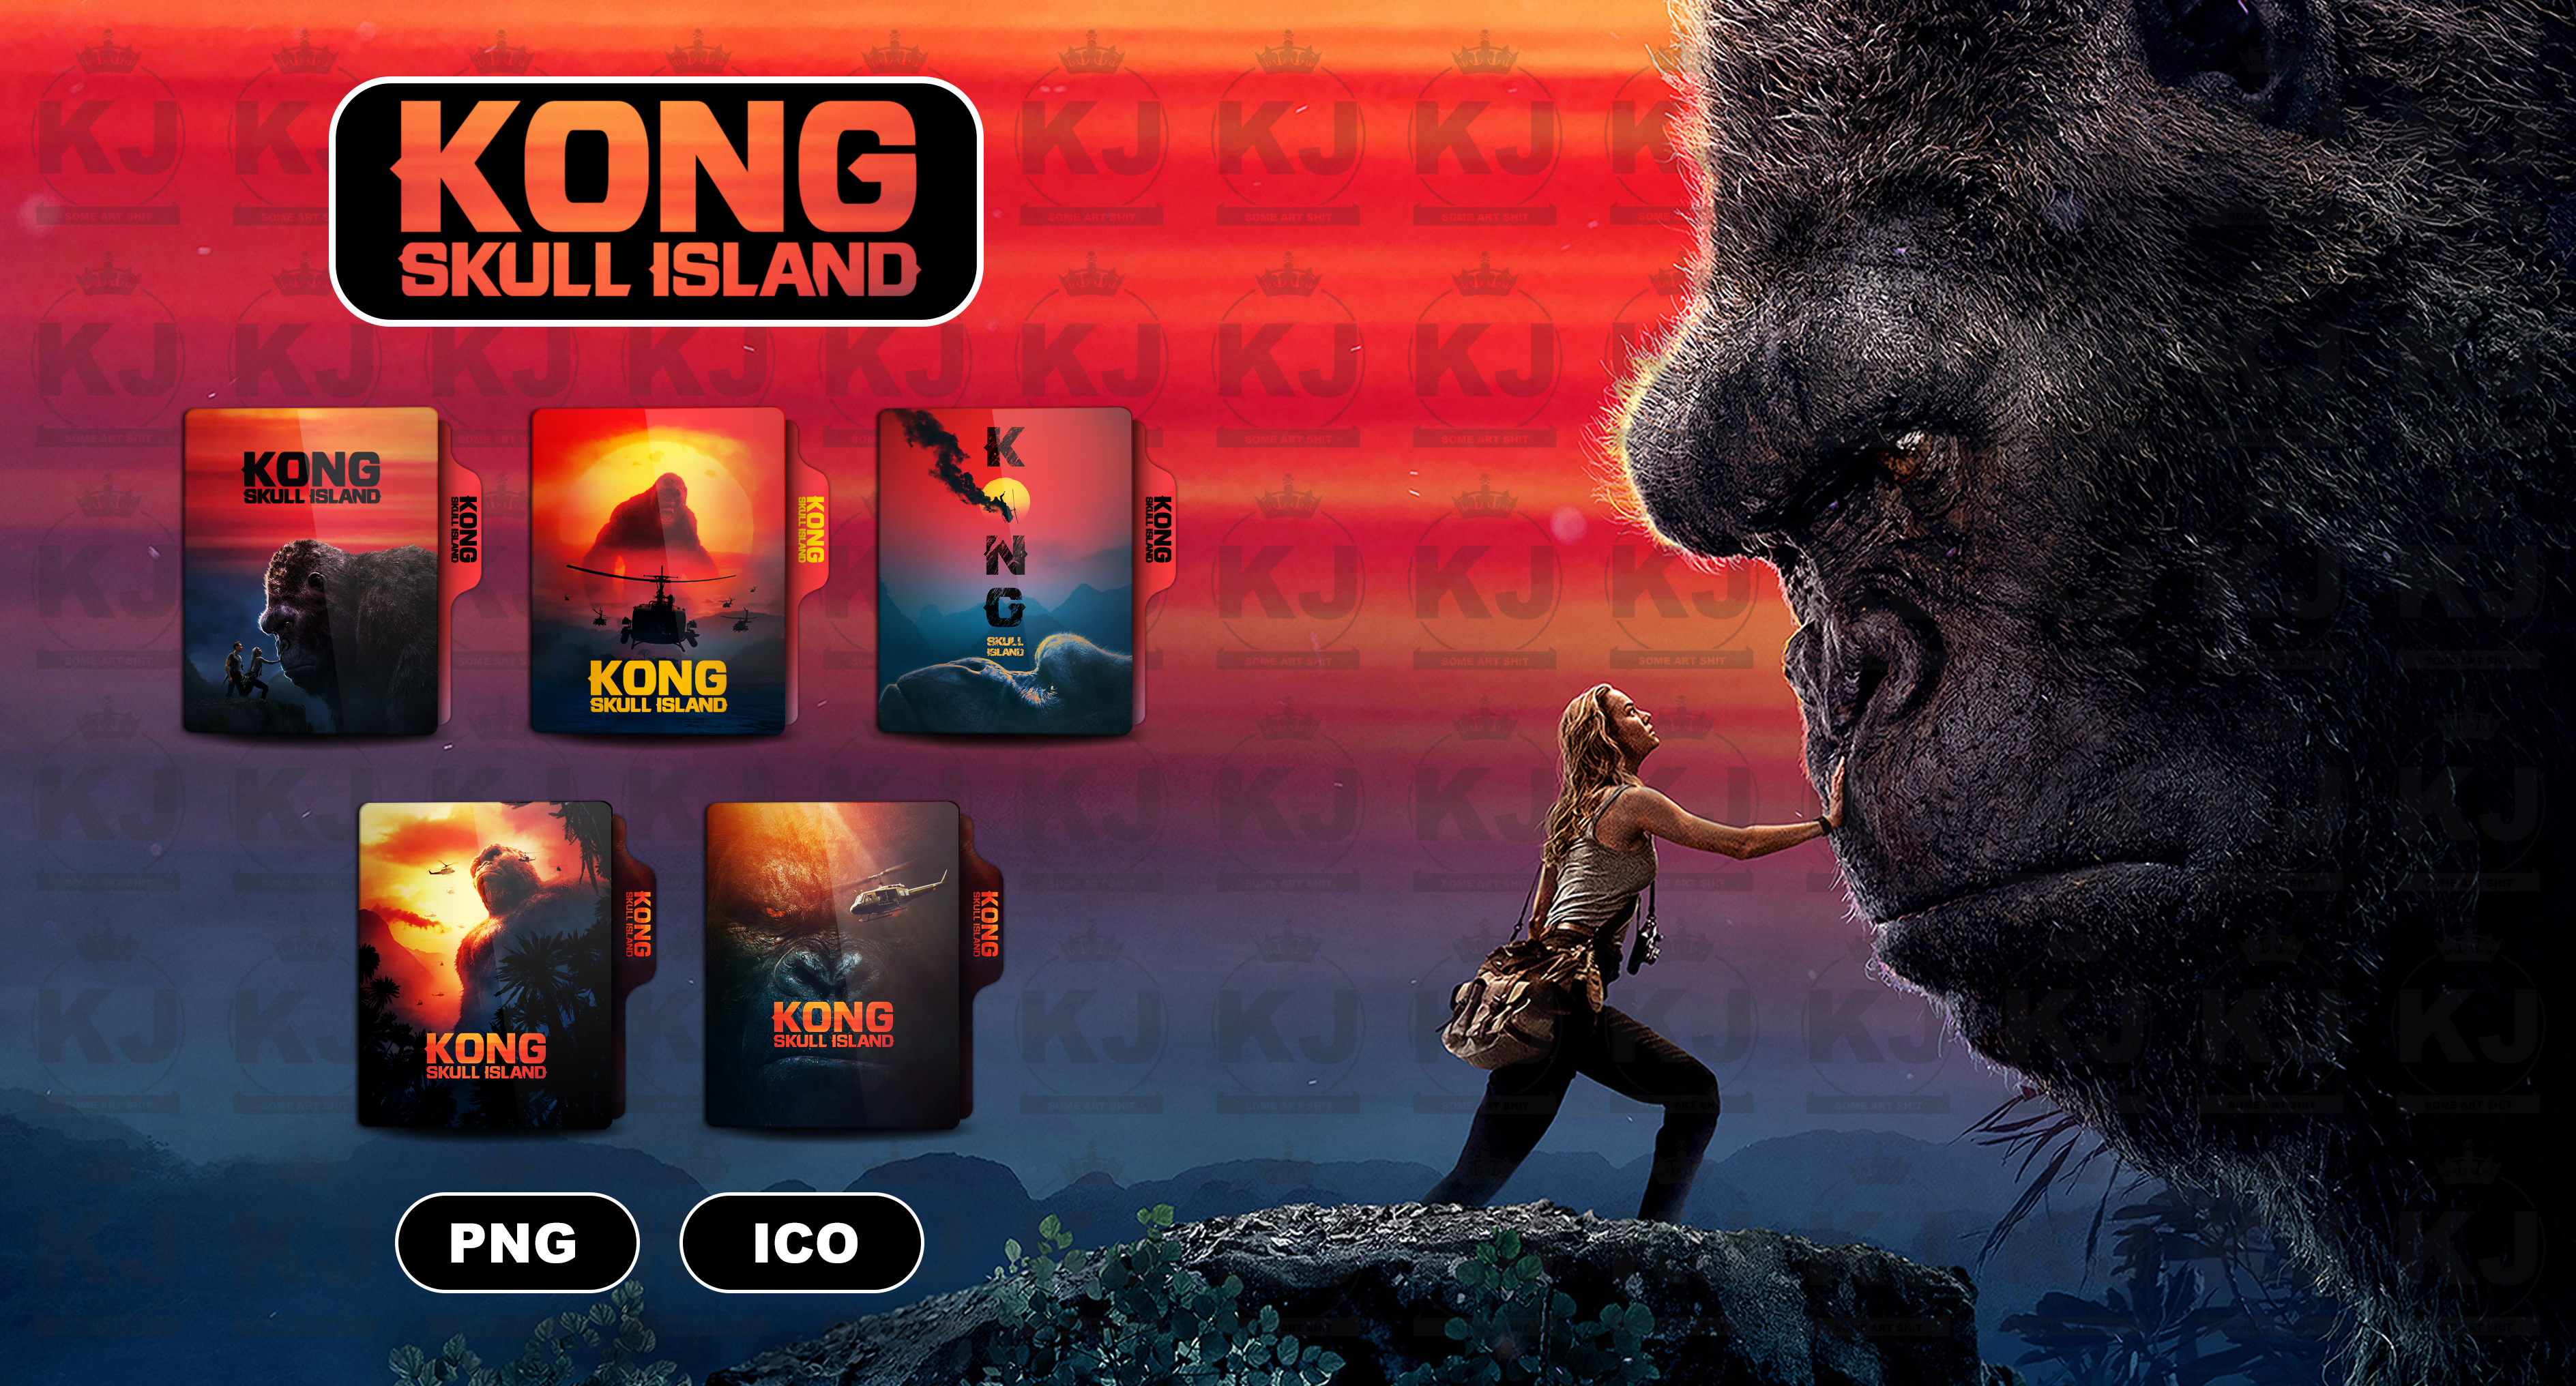 Kong Skull Island 2017 Folder Icon By Kingjoe93 On Deviantart